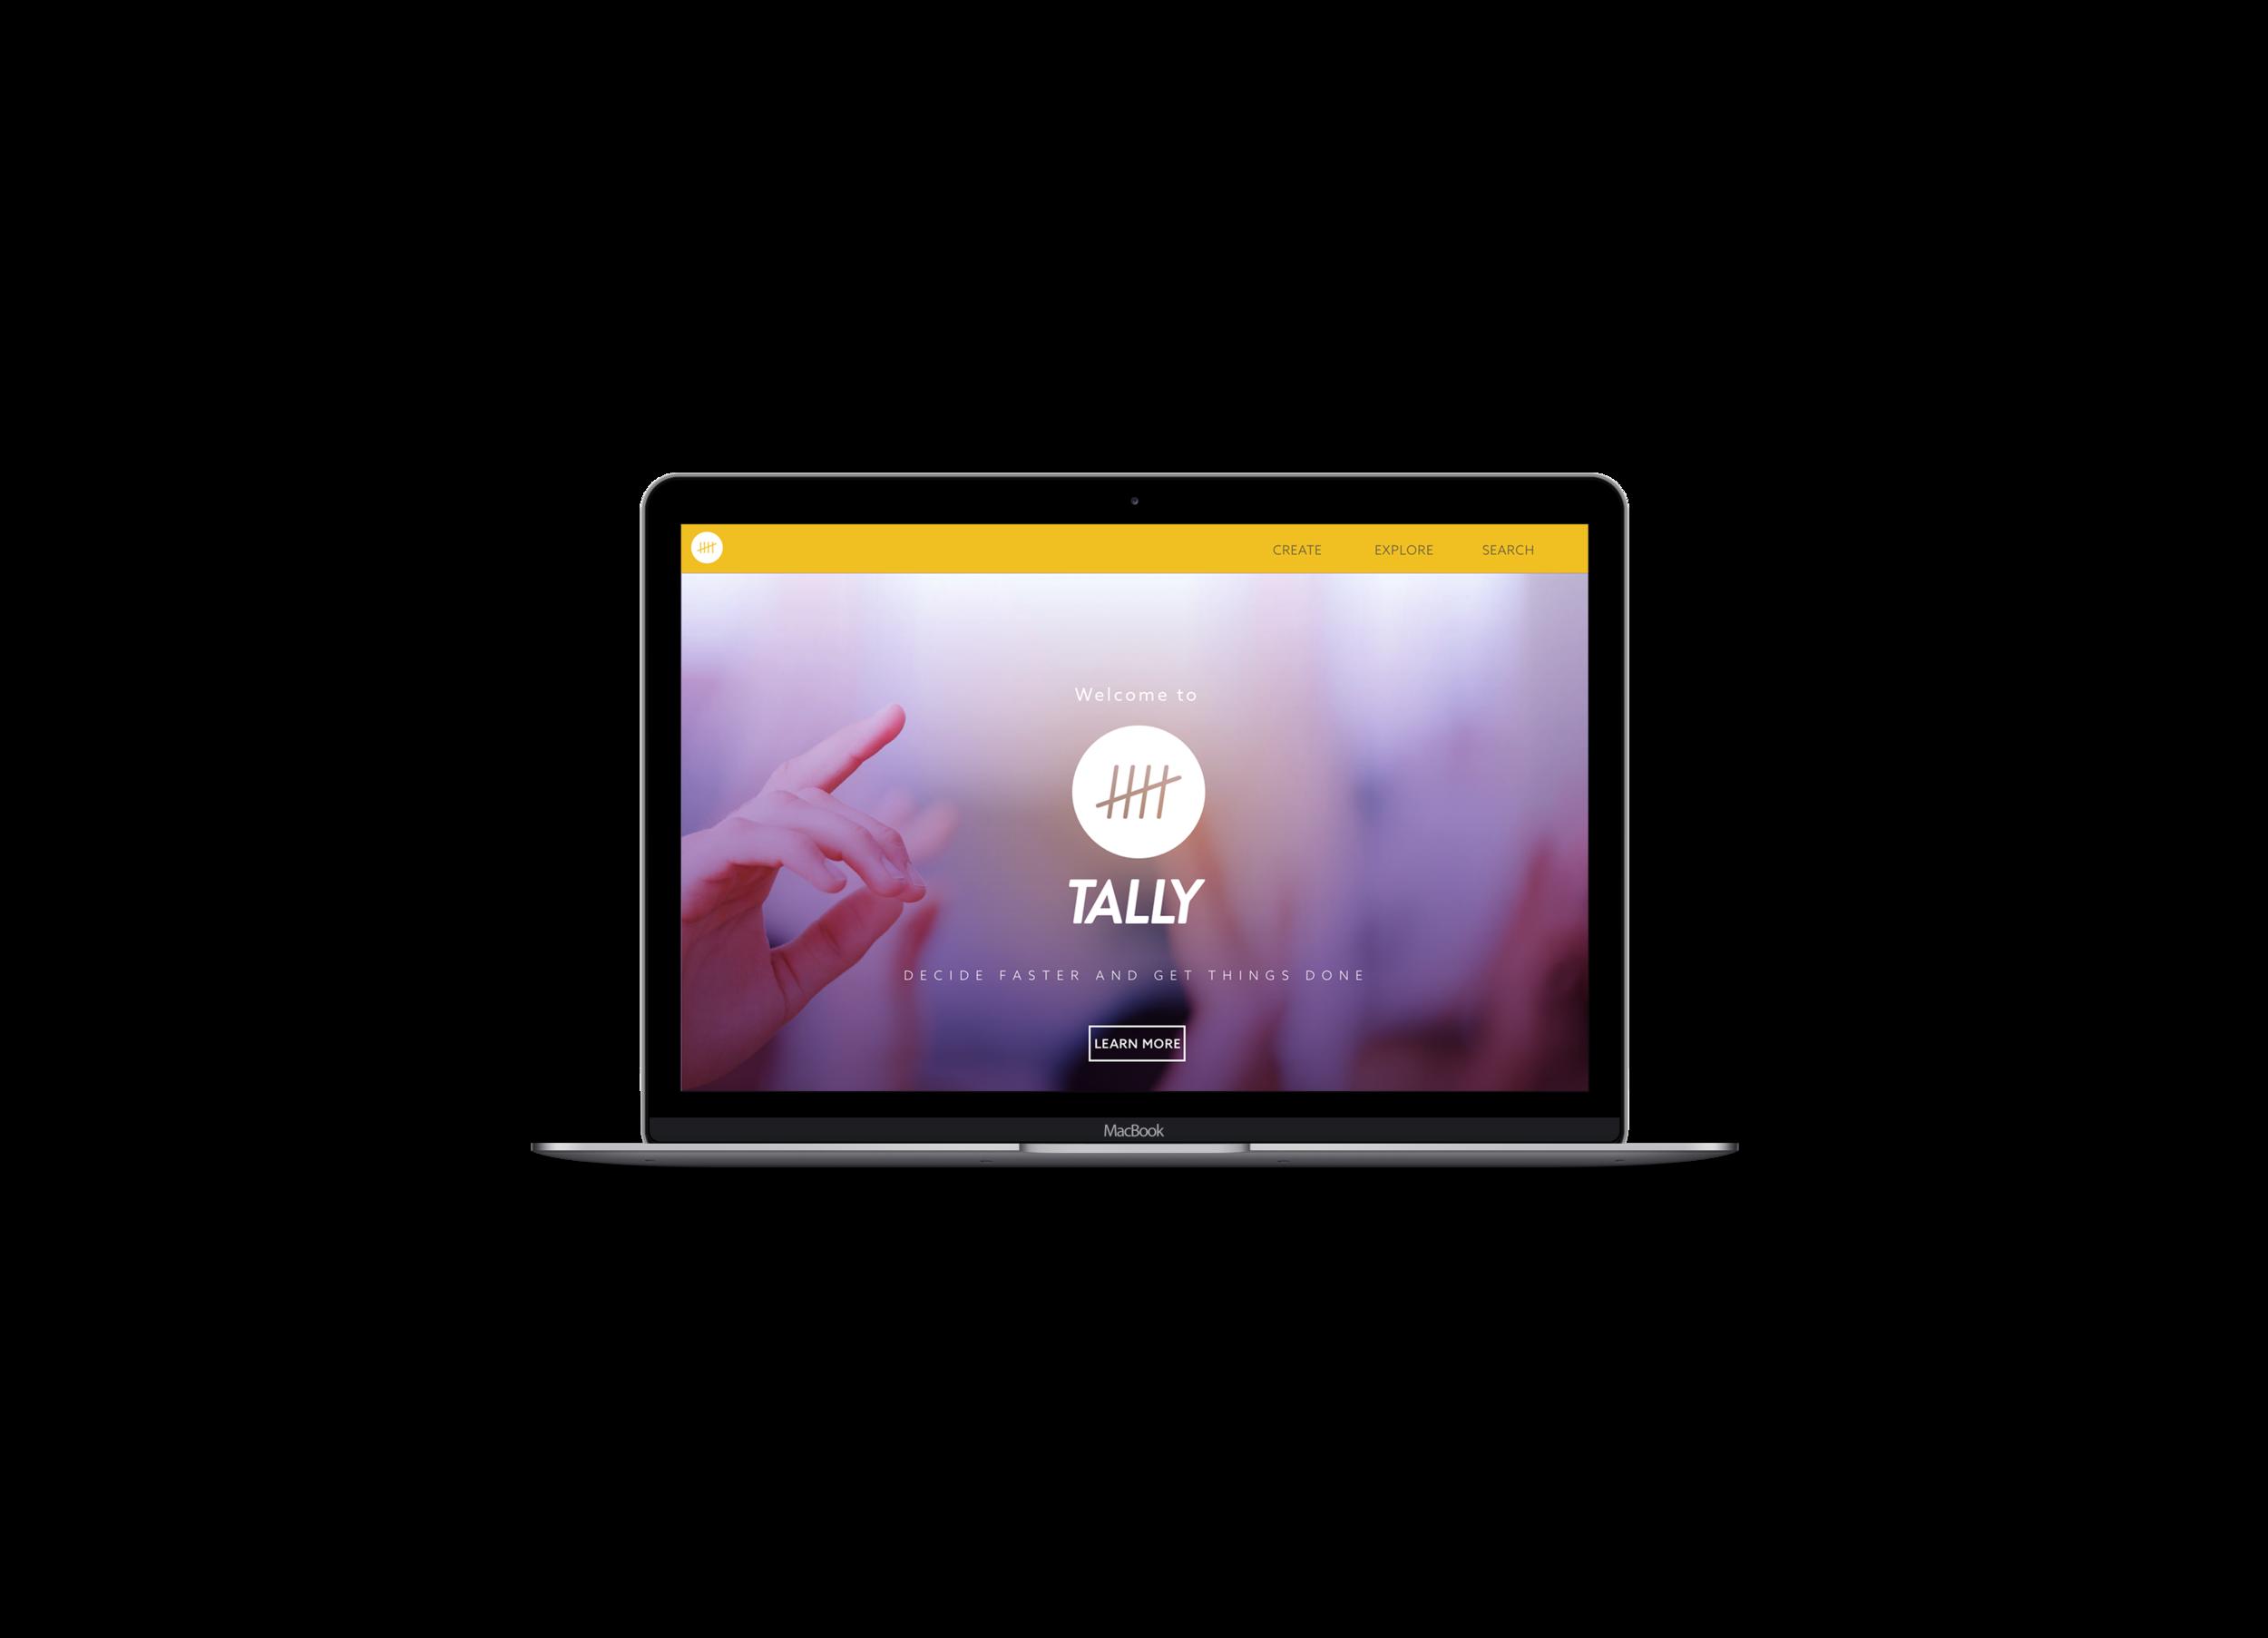 002-MacBook-Silver.png